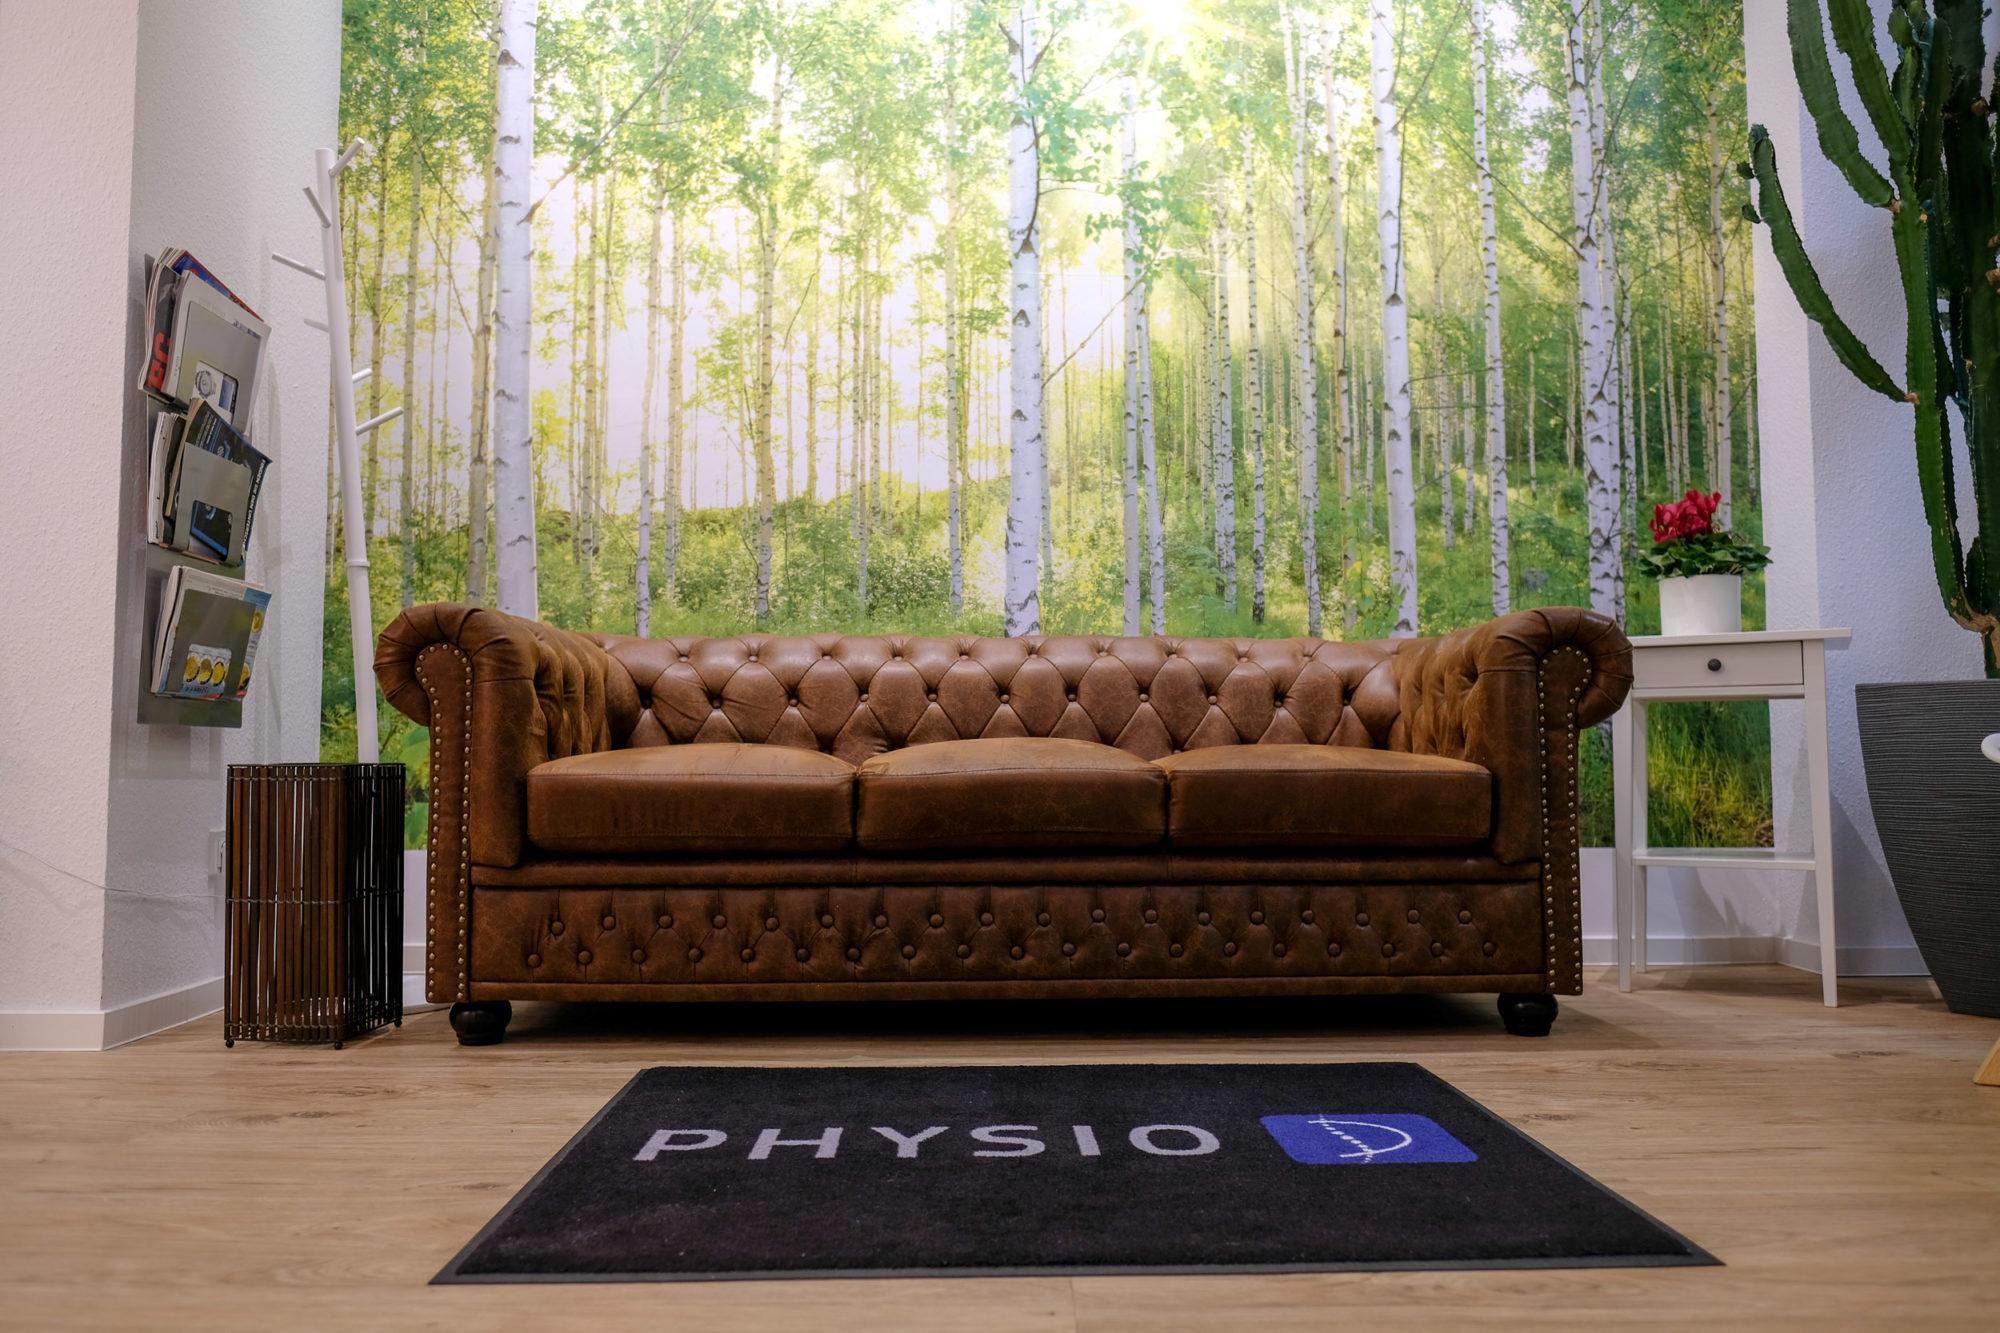 Physio-D - Physiotherapie in Berigsch Gladbach